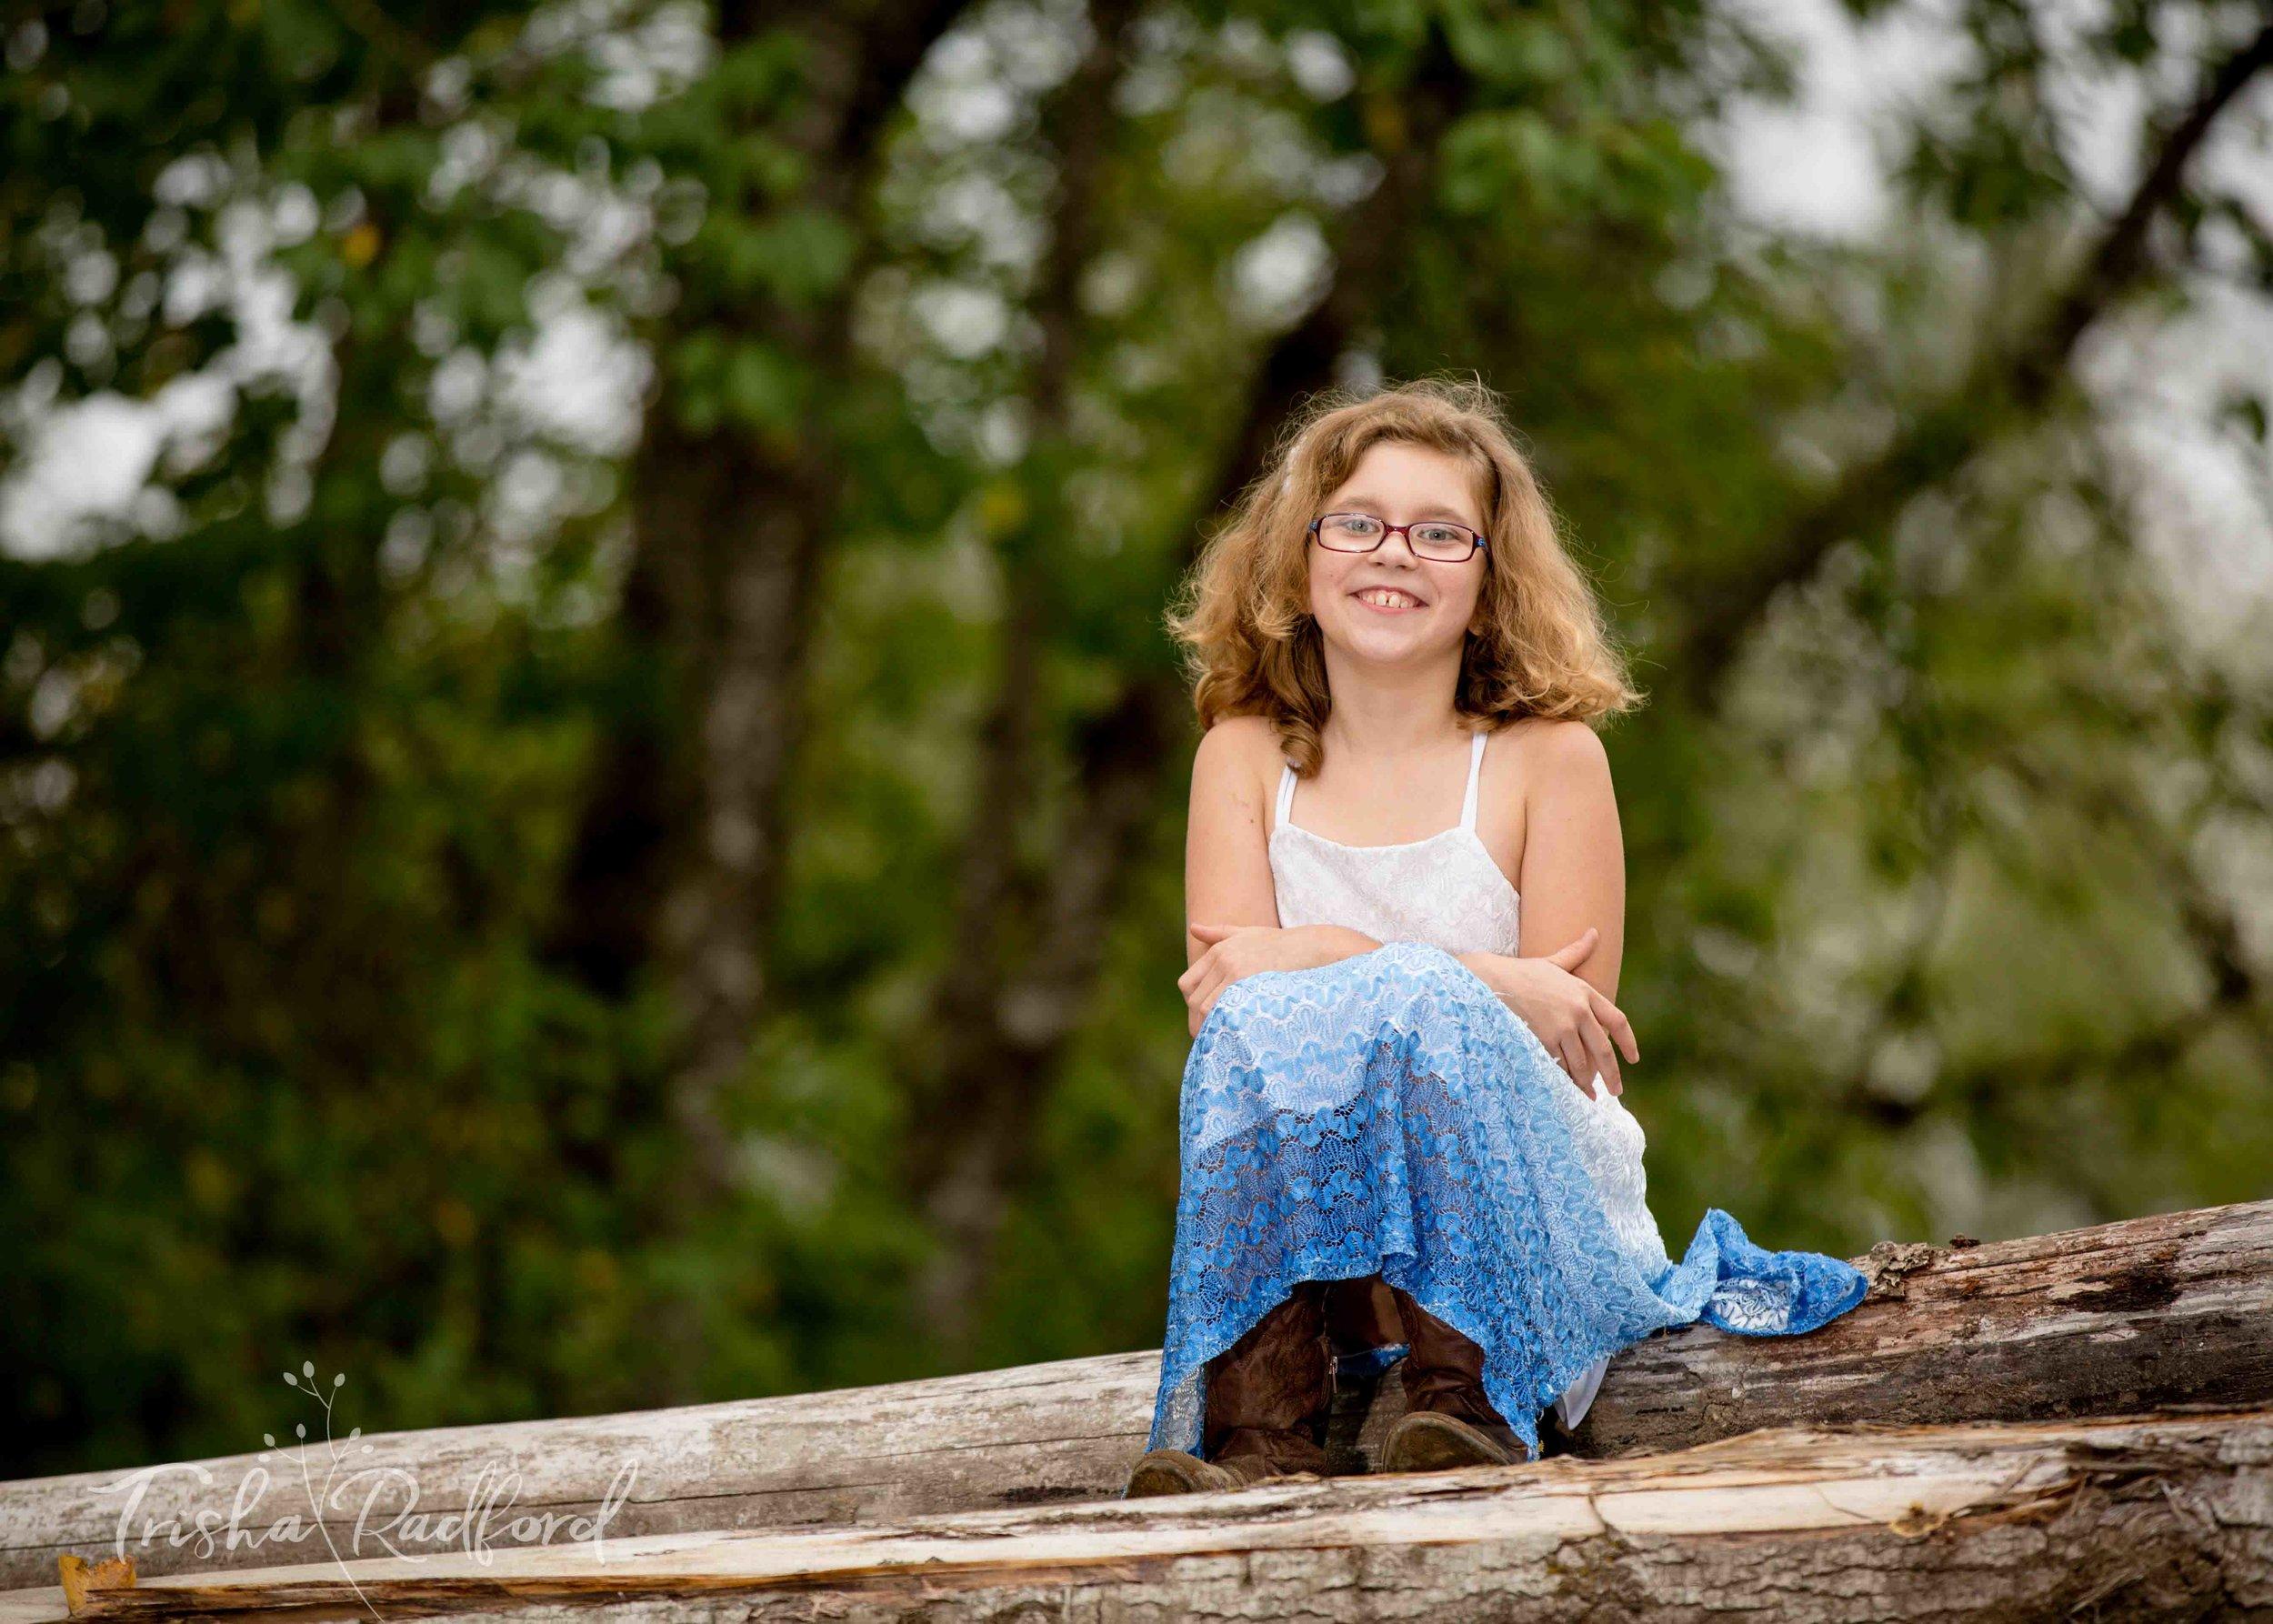 Snohomish County Family Photographer   Lake Stevens, WA